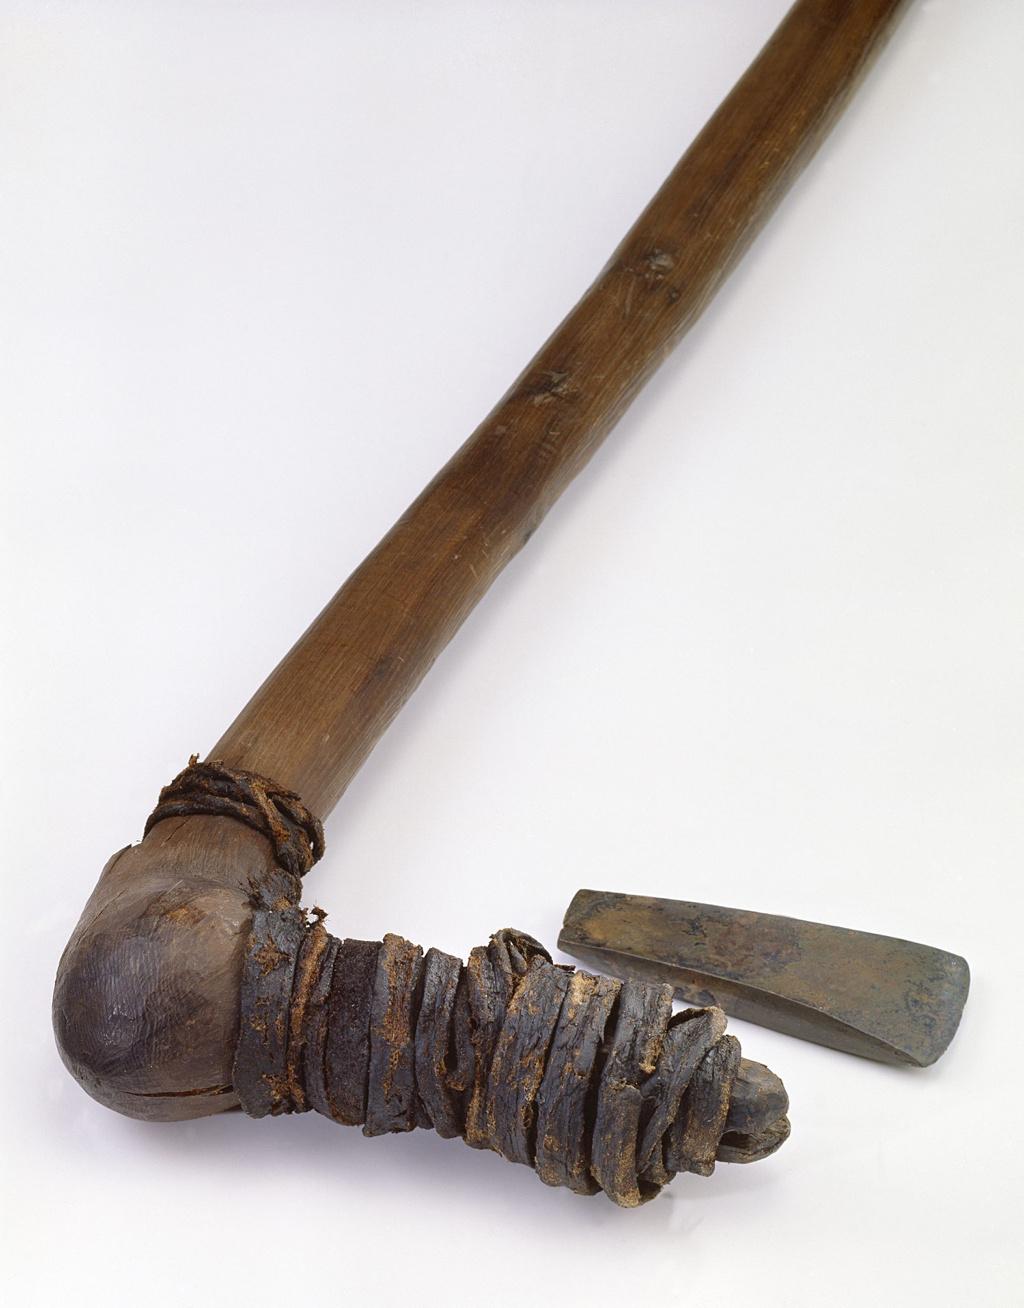 El hombre de Ötzi murió a cientos de kilómetros de su hogar